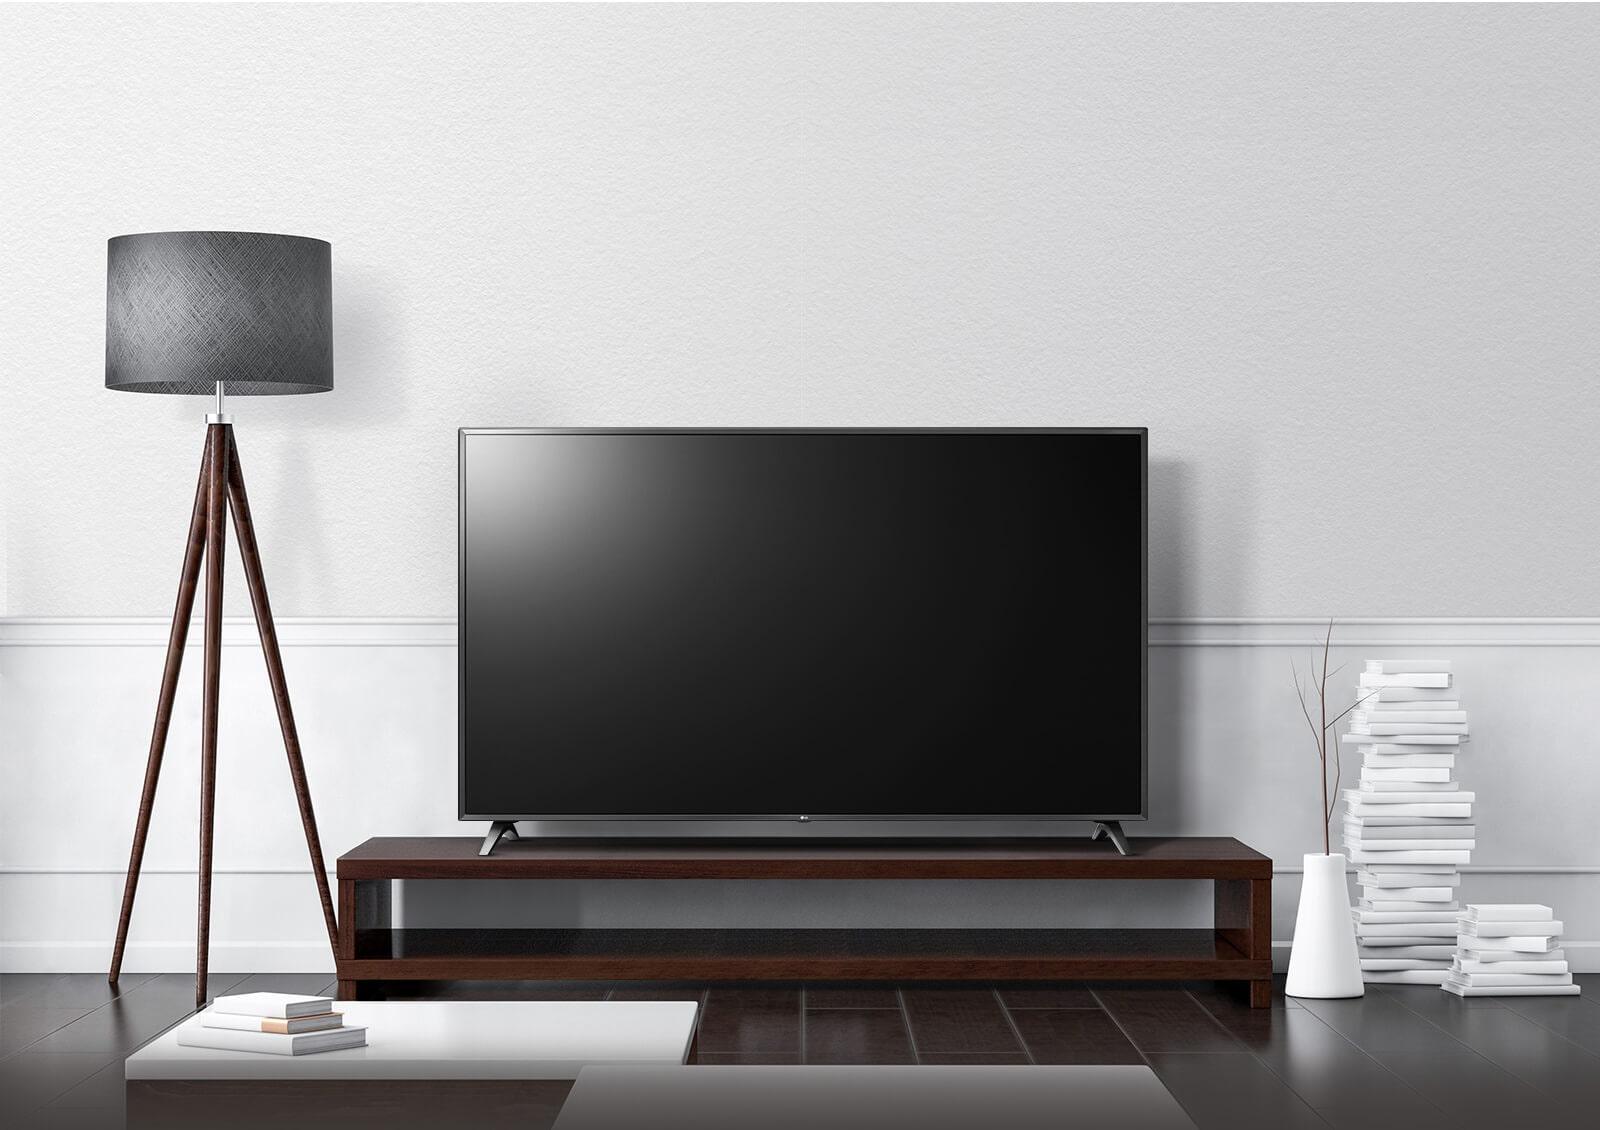 TV-UHD-UM71-08-Design-Desktop